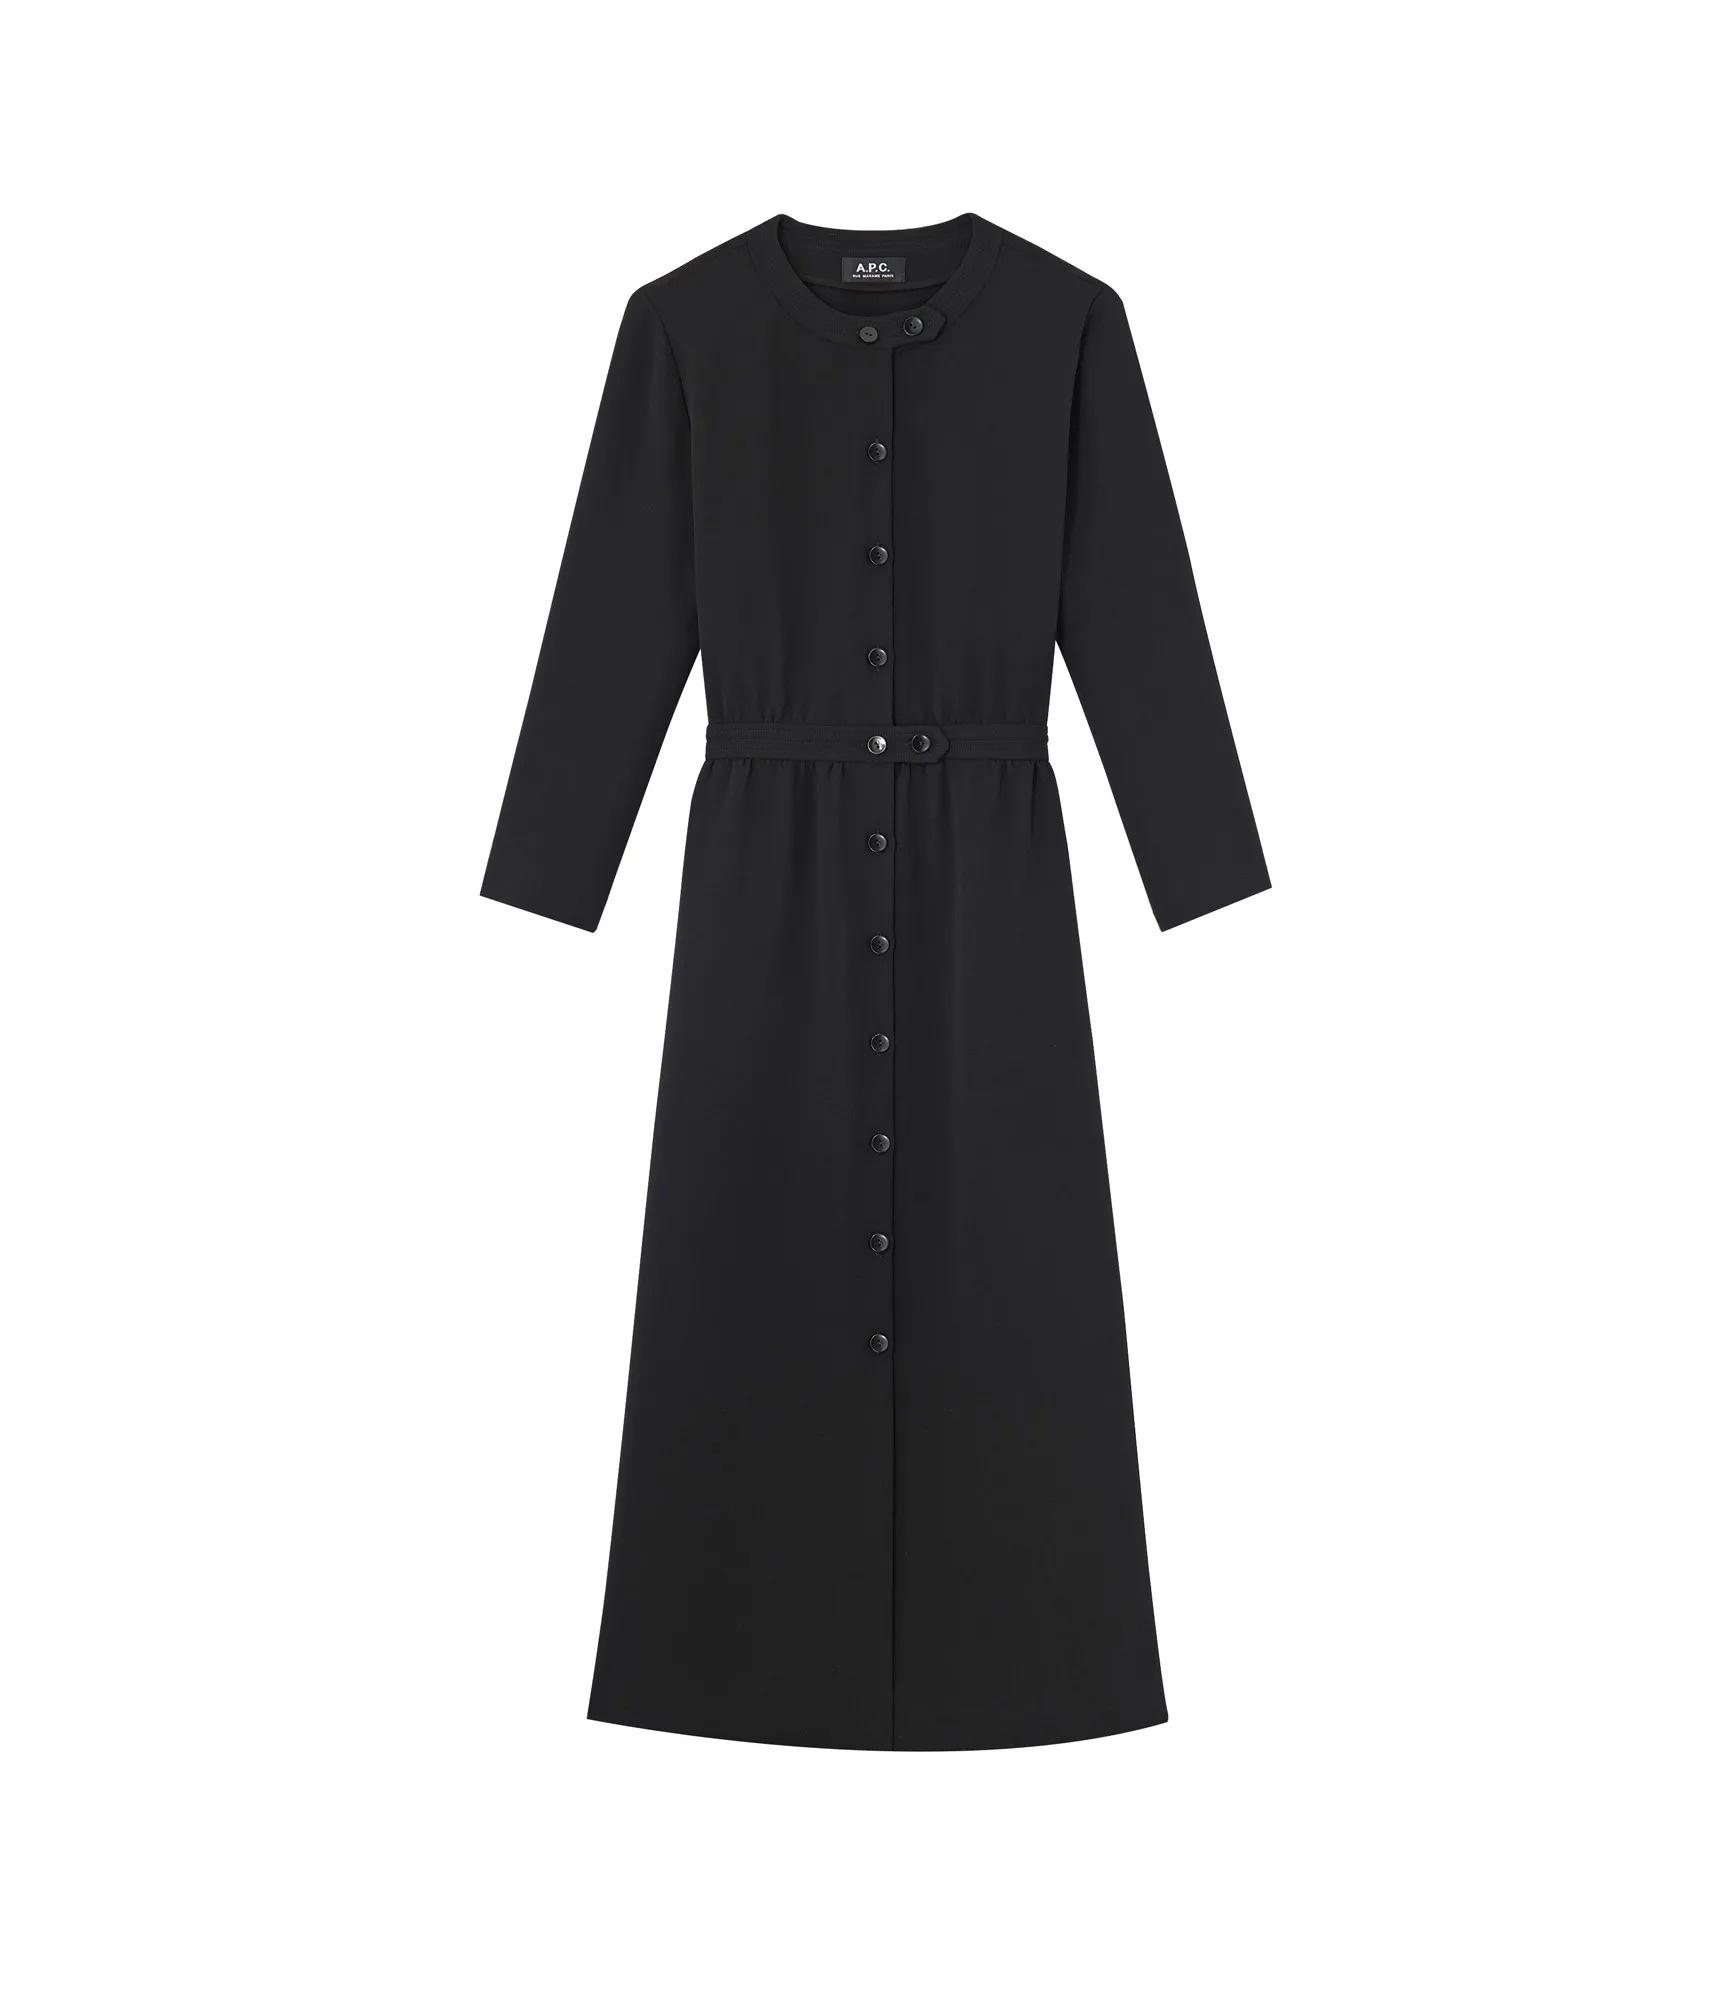 Lux dress black